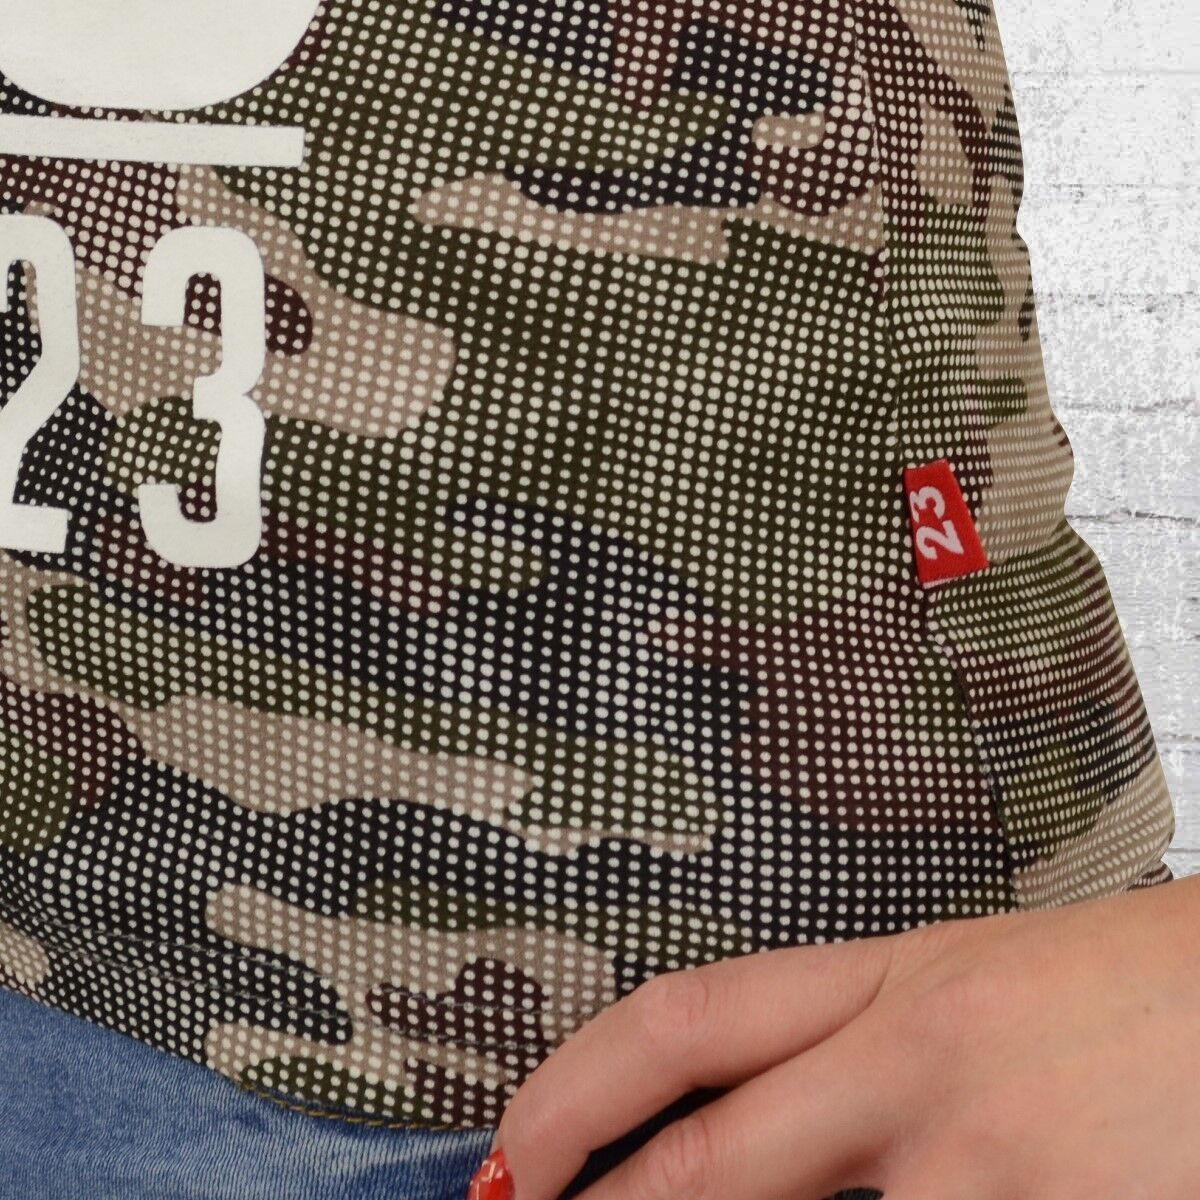 Label 23 Bad Ass Camo Camo Camo Damen T-Shirt camouflage Frauen Tshirt | Zürich  7e0b1d